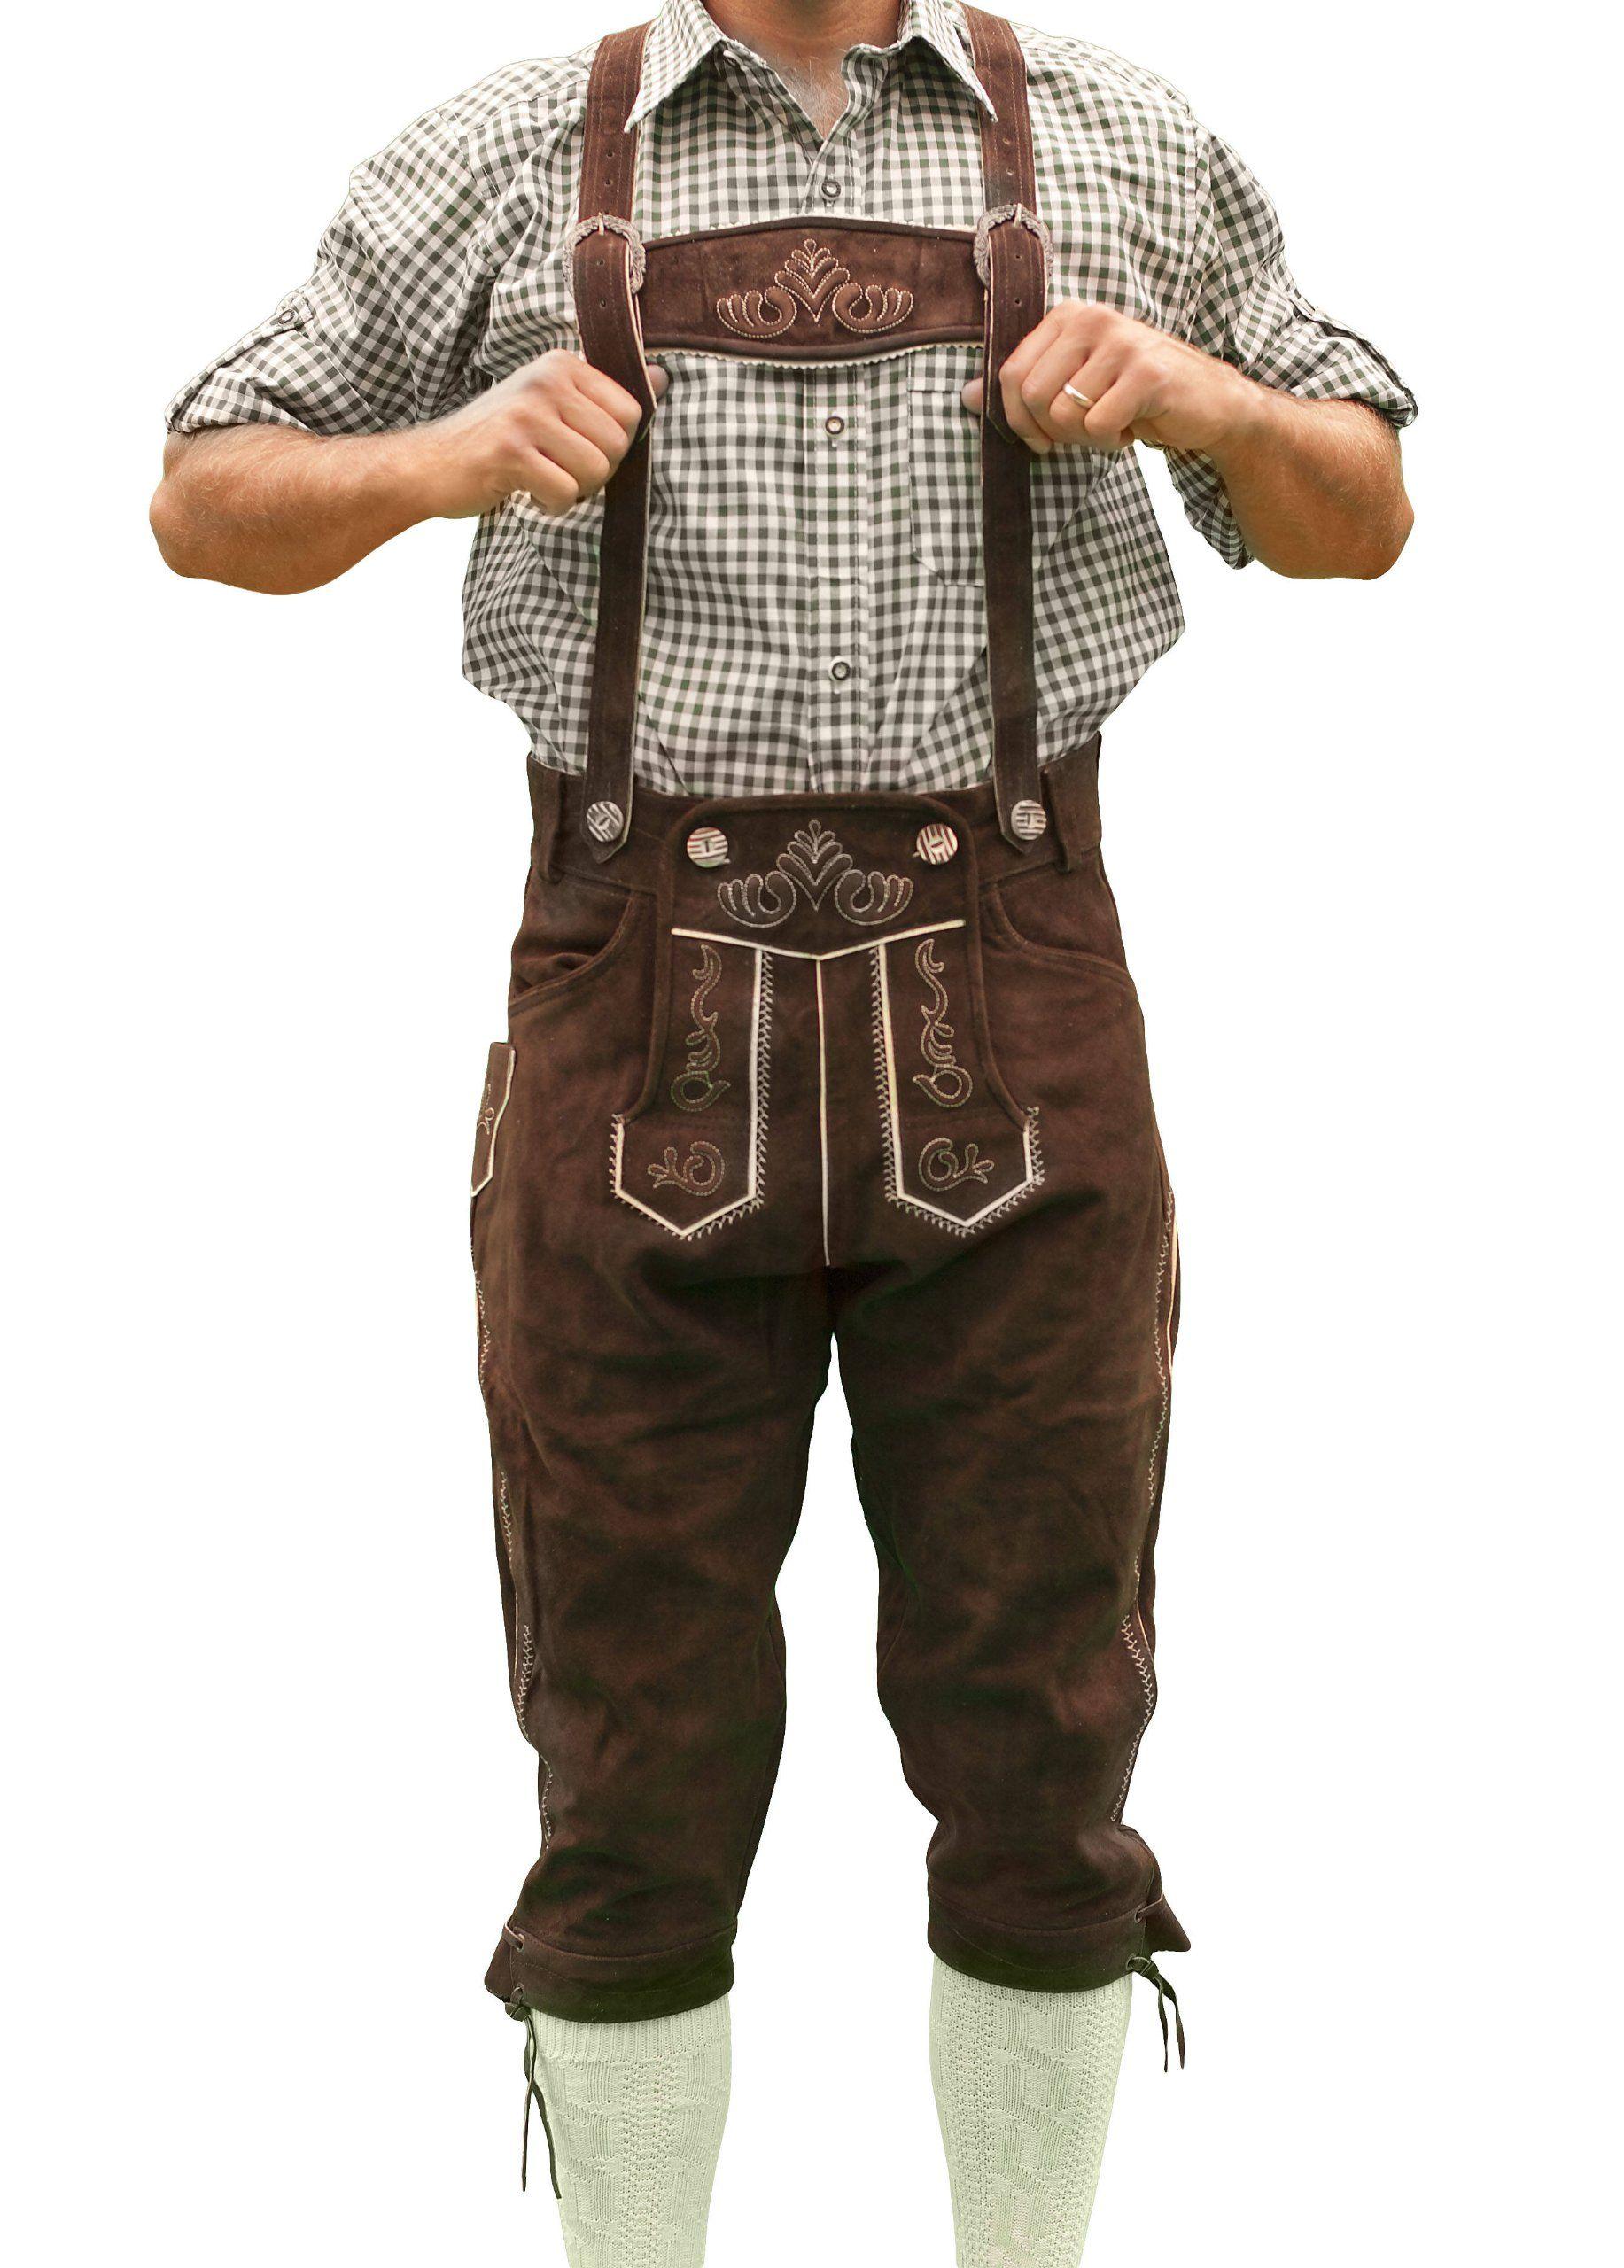 UK Mens Deluex Bavarian Lederhosen German Oktoberfest Shorts With Free Suspender